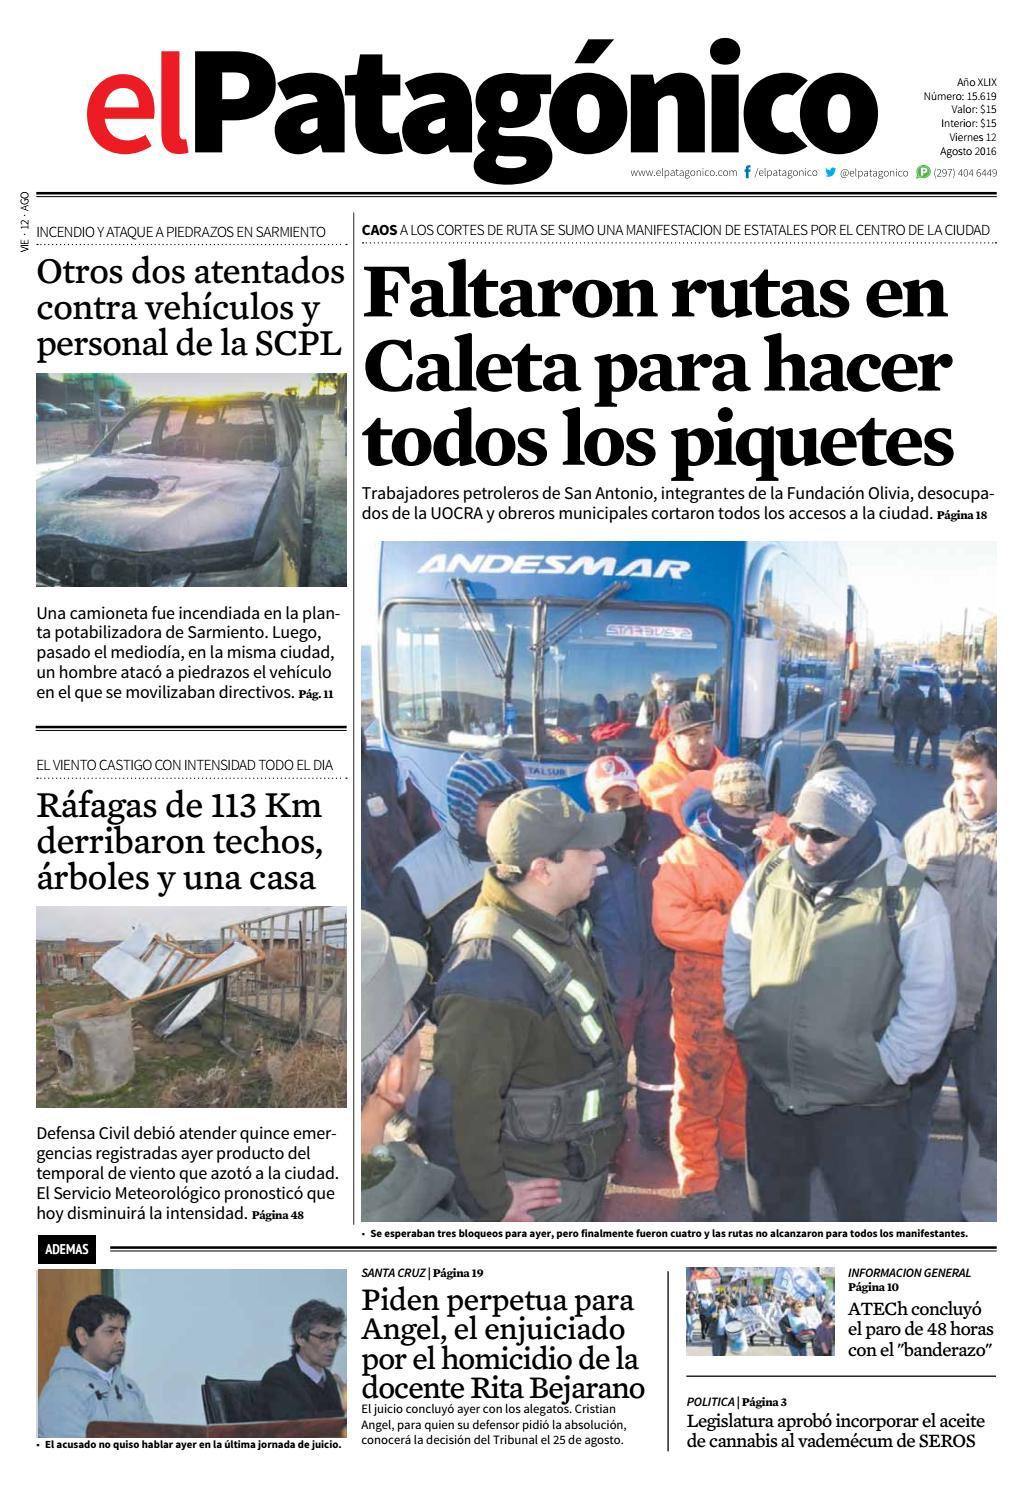 edicion225211082016.pdf by El Patagonico - issuu